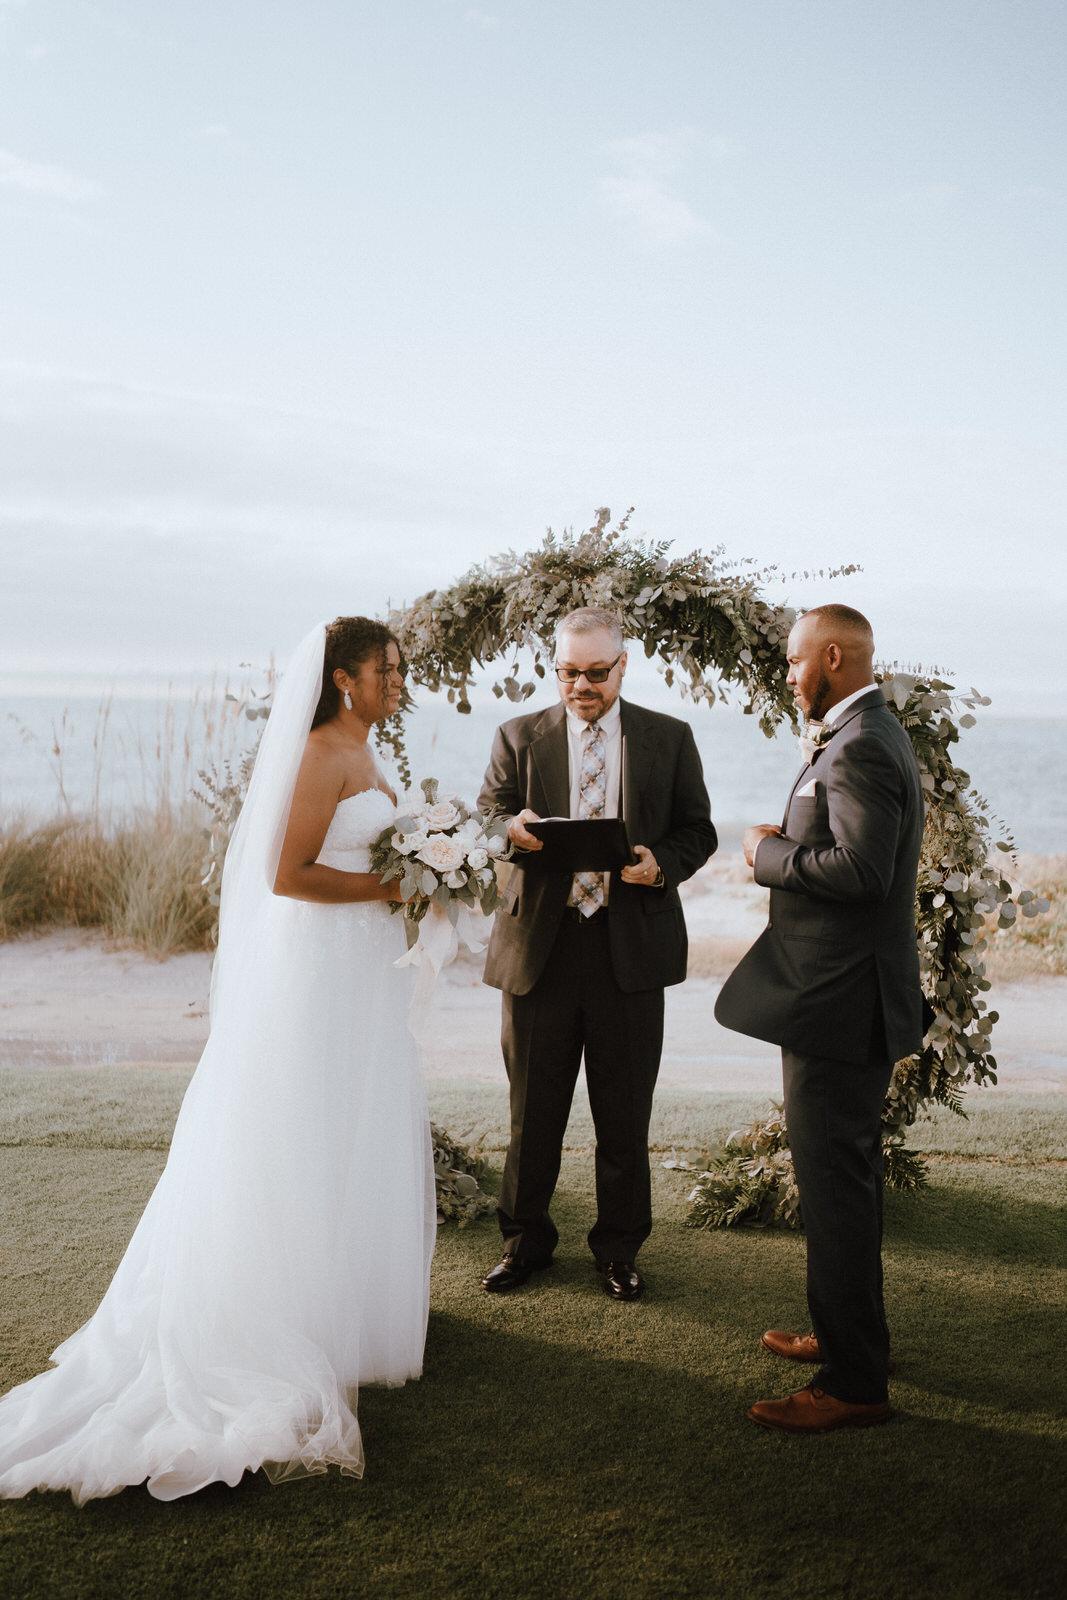 South Seas Island Resort Elopement- Alyana and Shawn- Michelle Gonzalez Photography-425.JPG